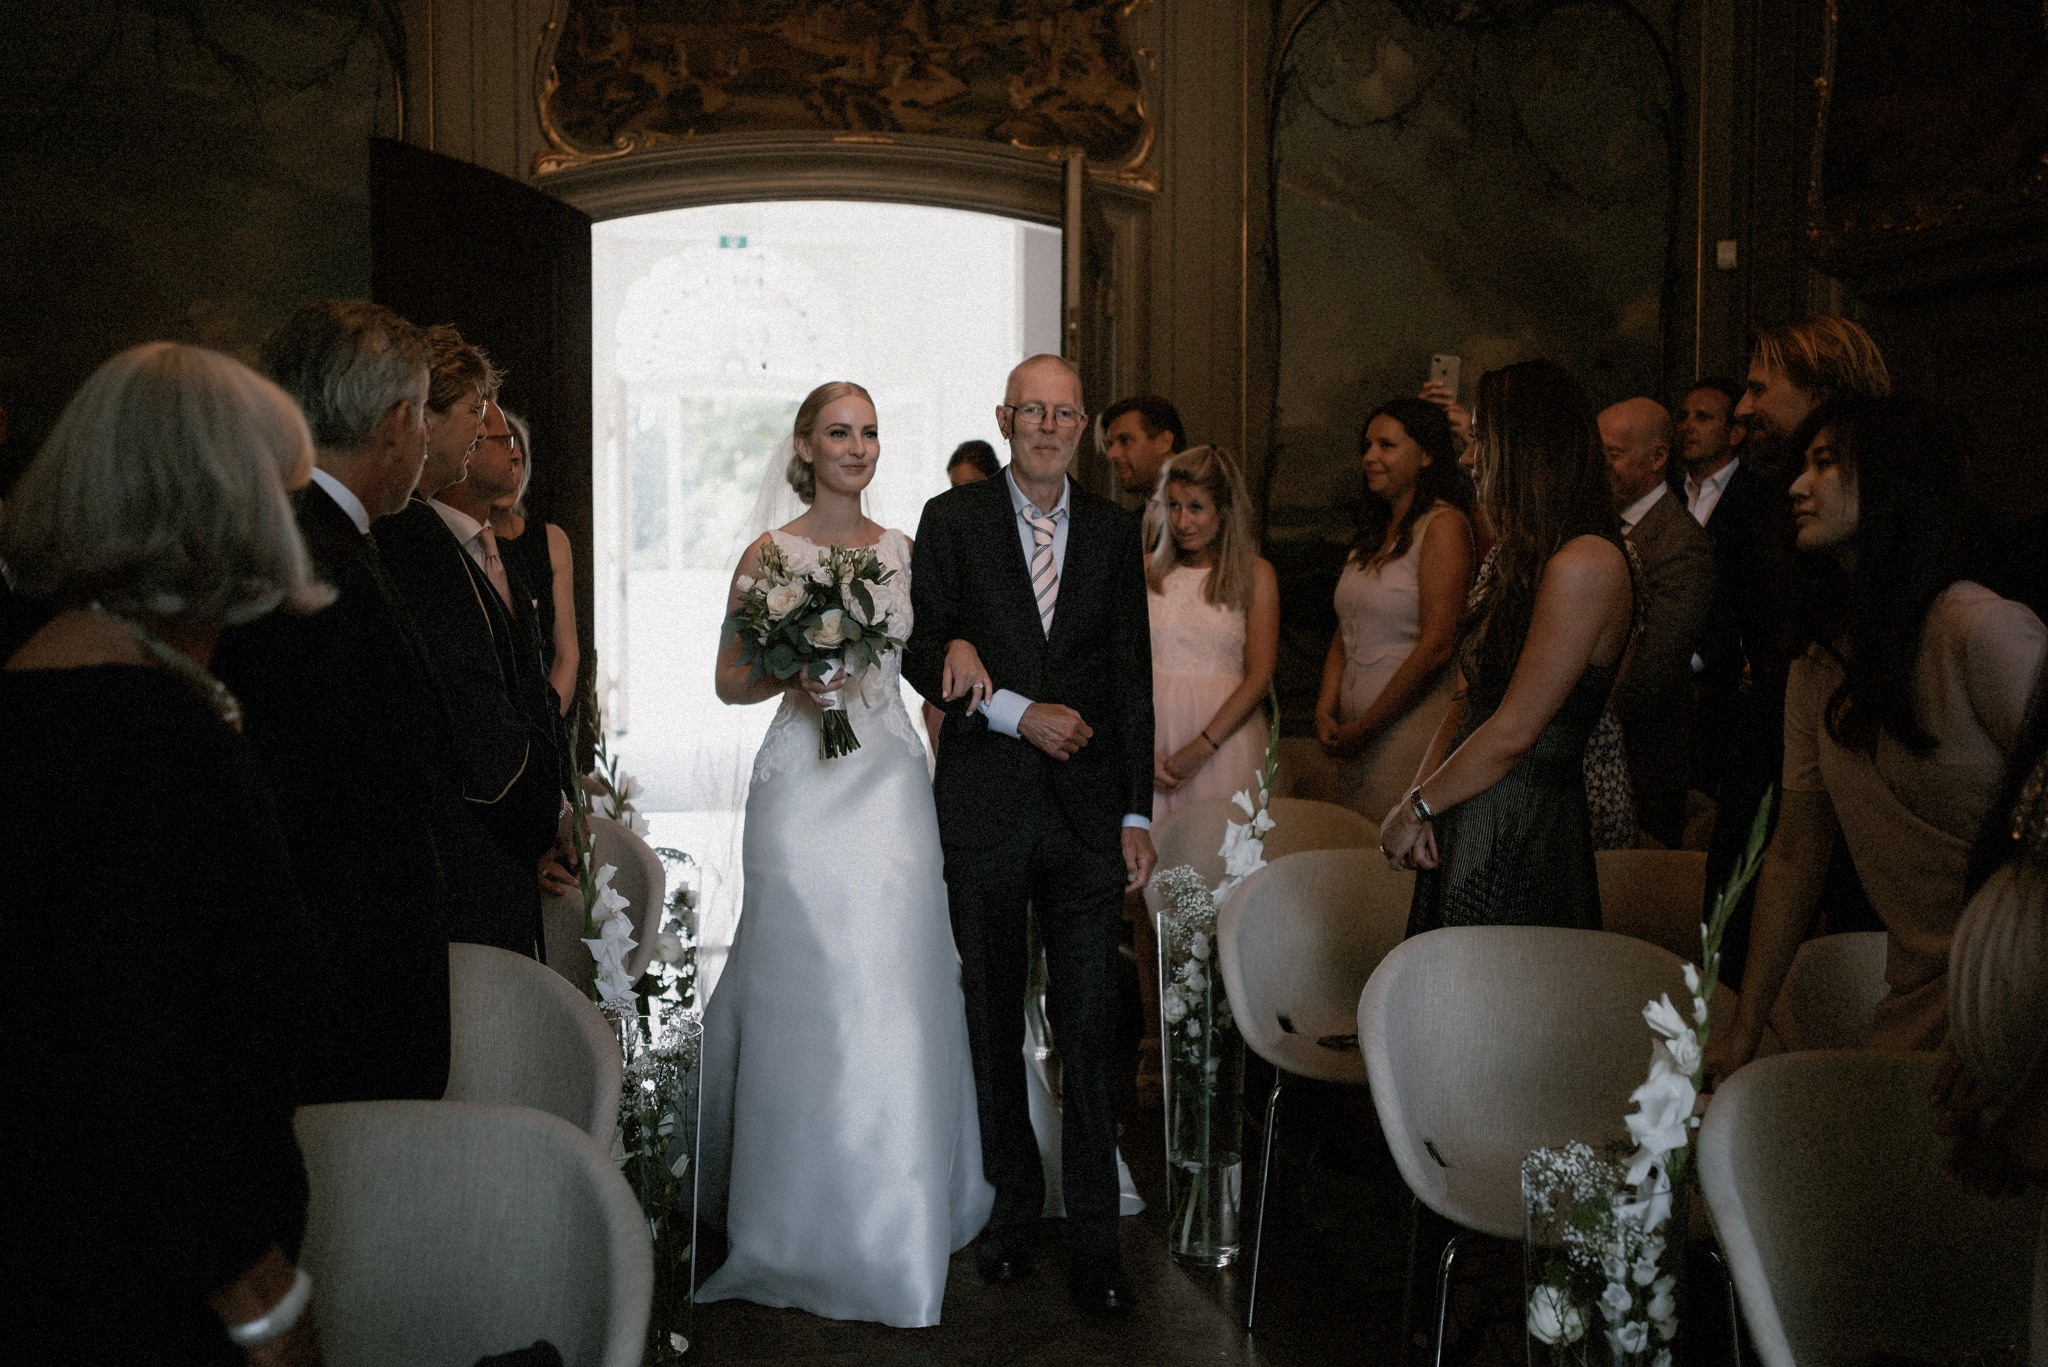 Bruidsfotografie Buitenplaats Sparrendaal - Naomi van der Kraan 0020.jpg